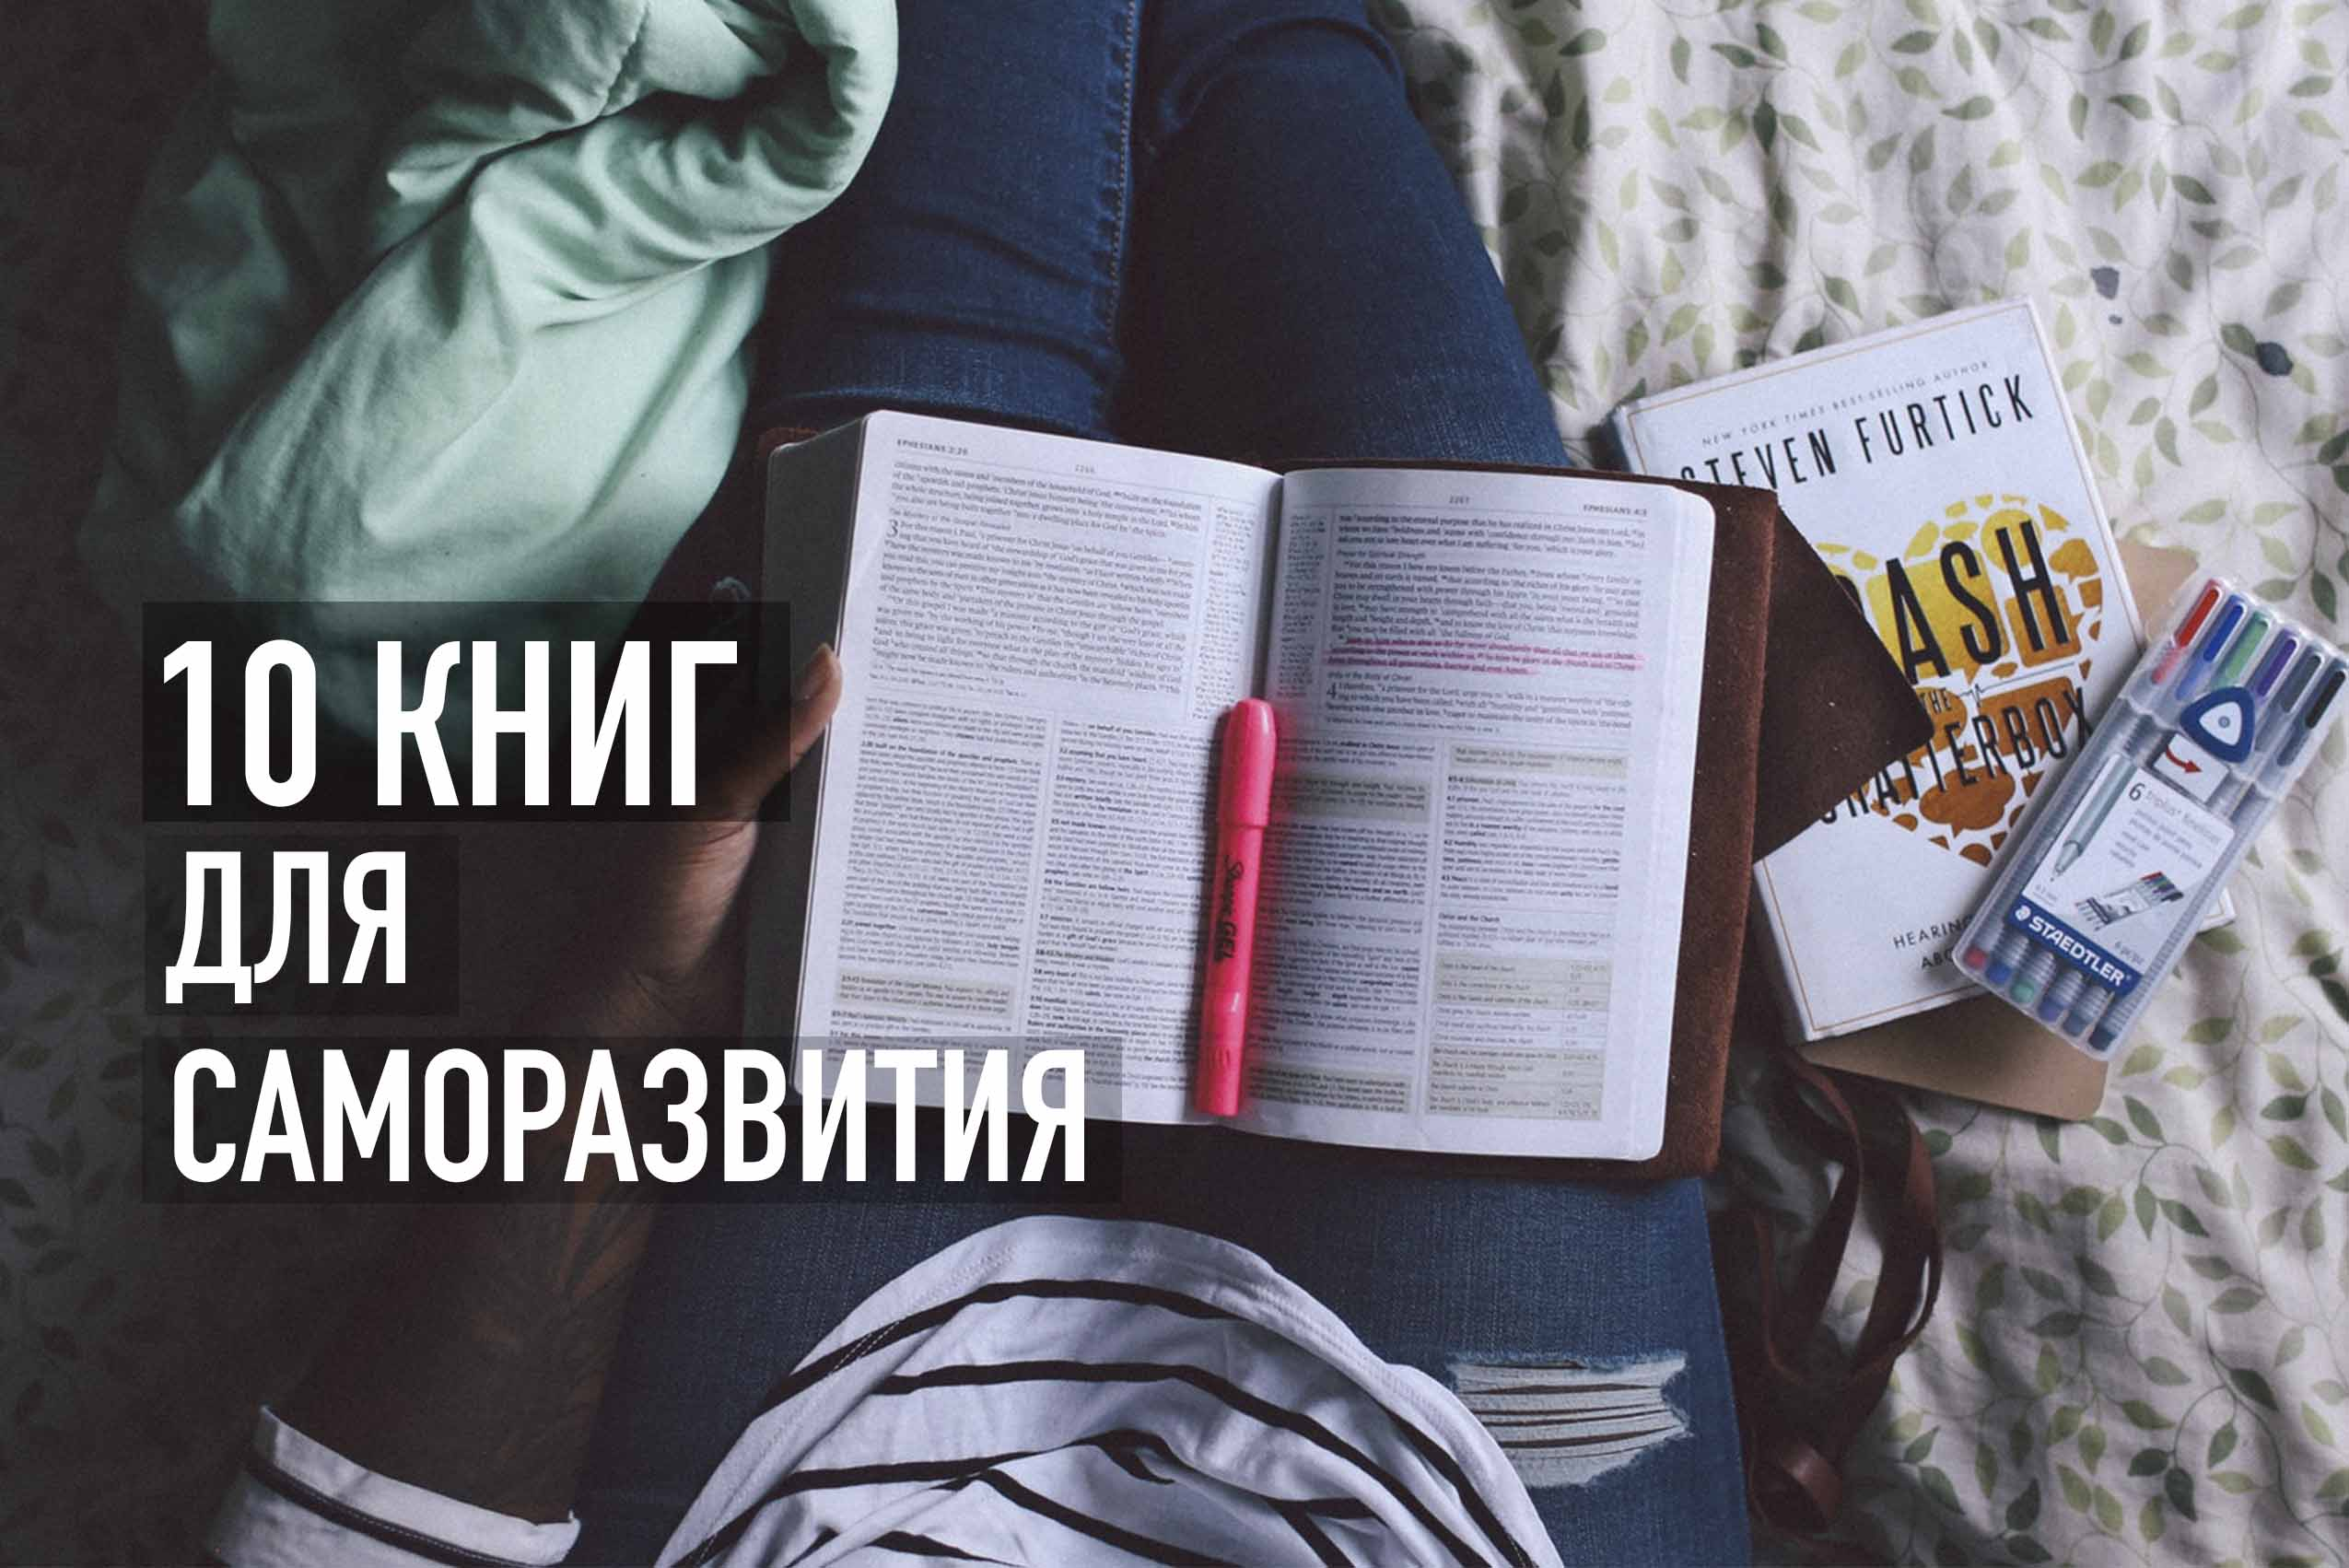 Подборка 10 книг для саморазвития